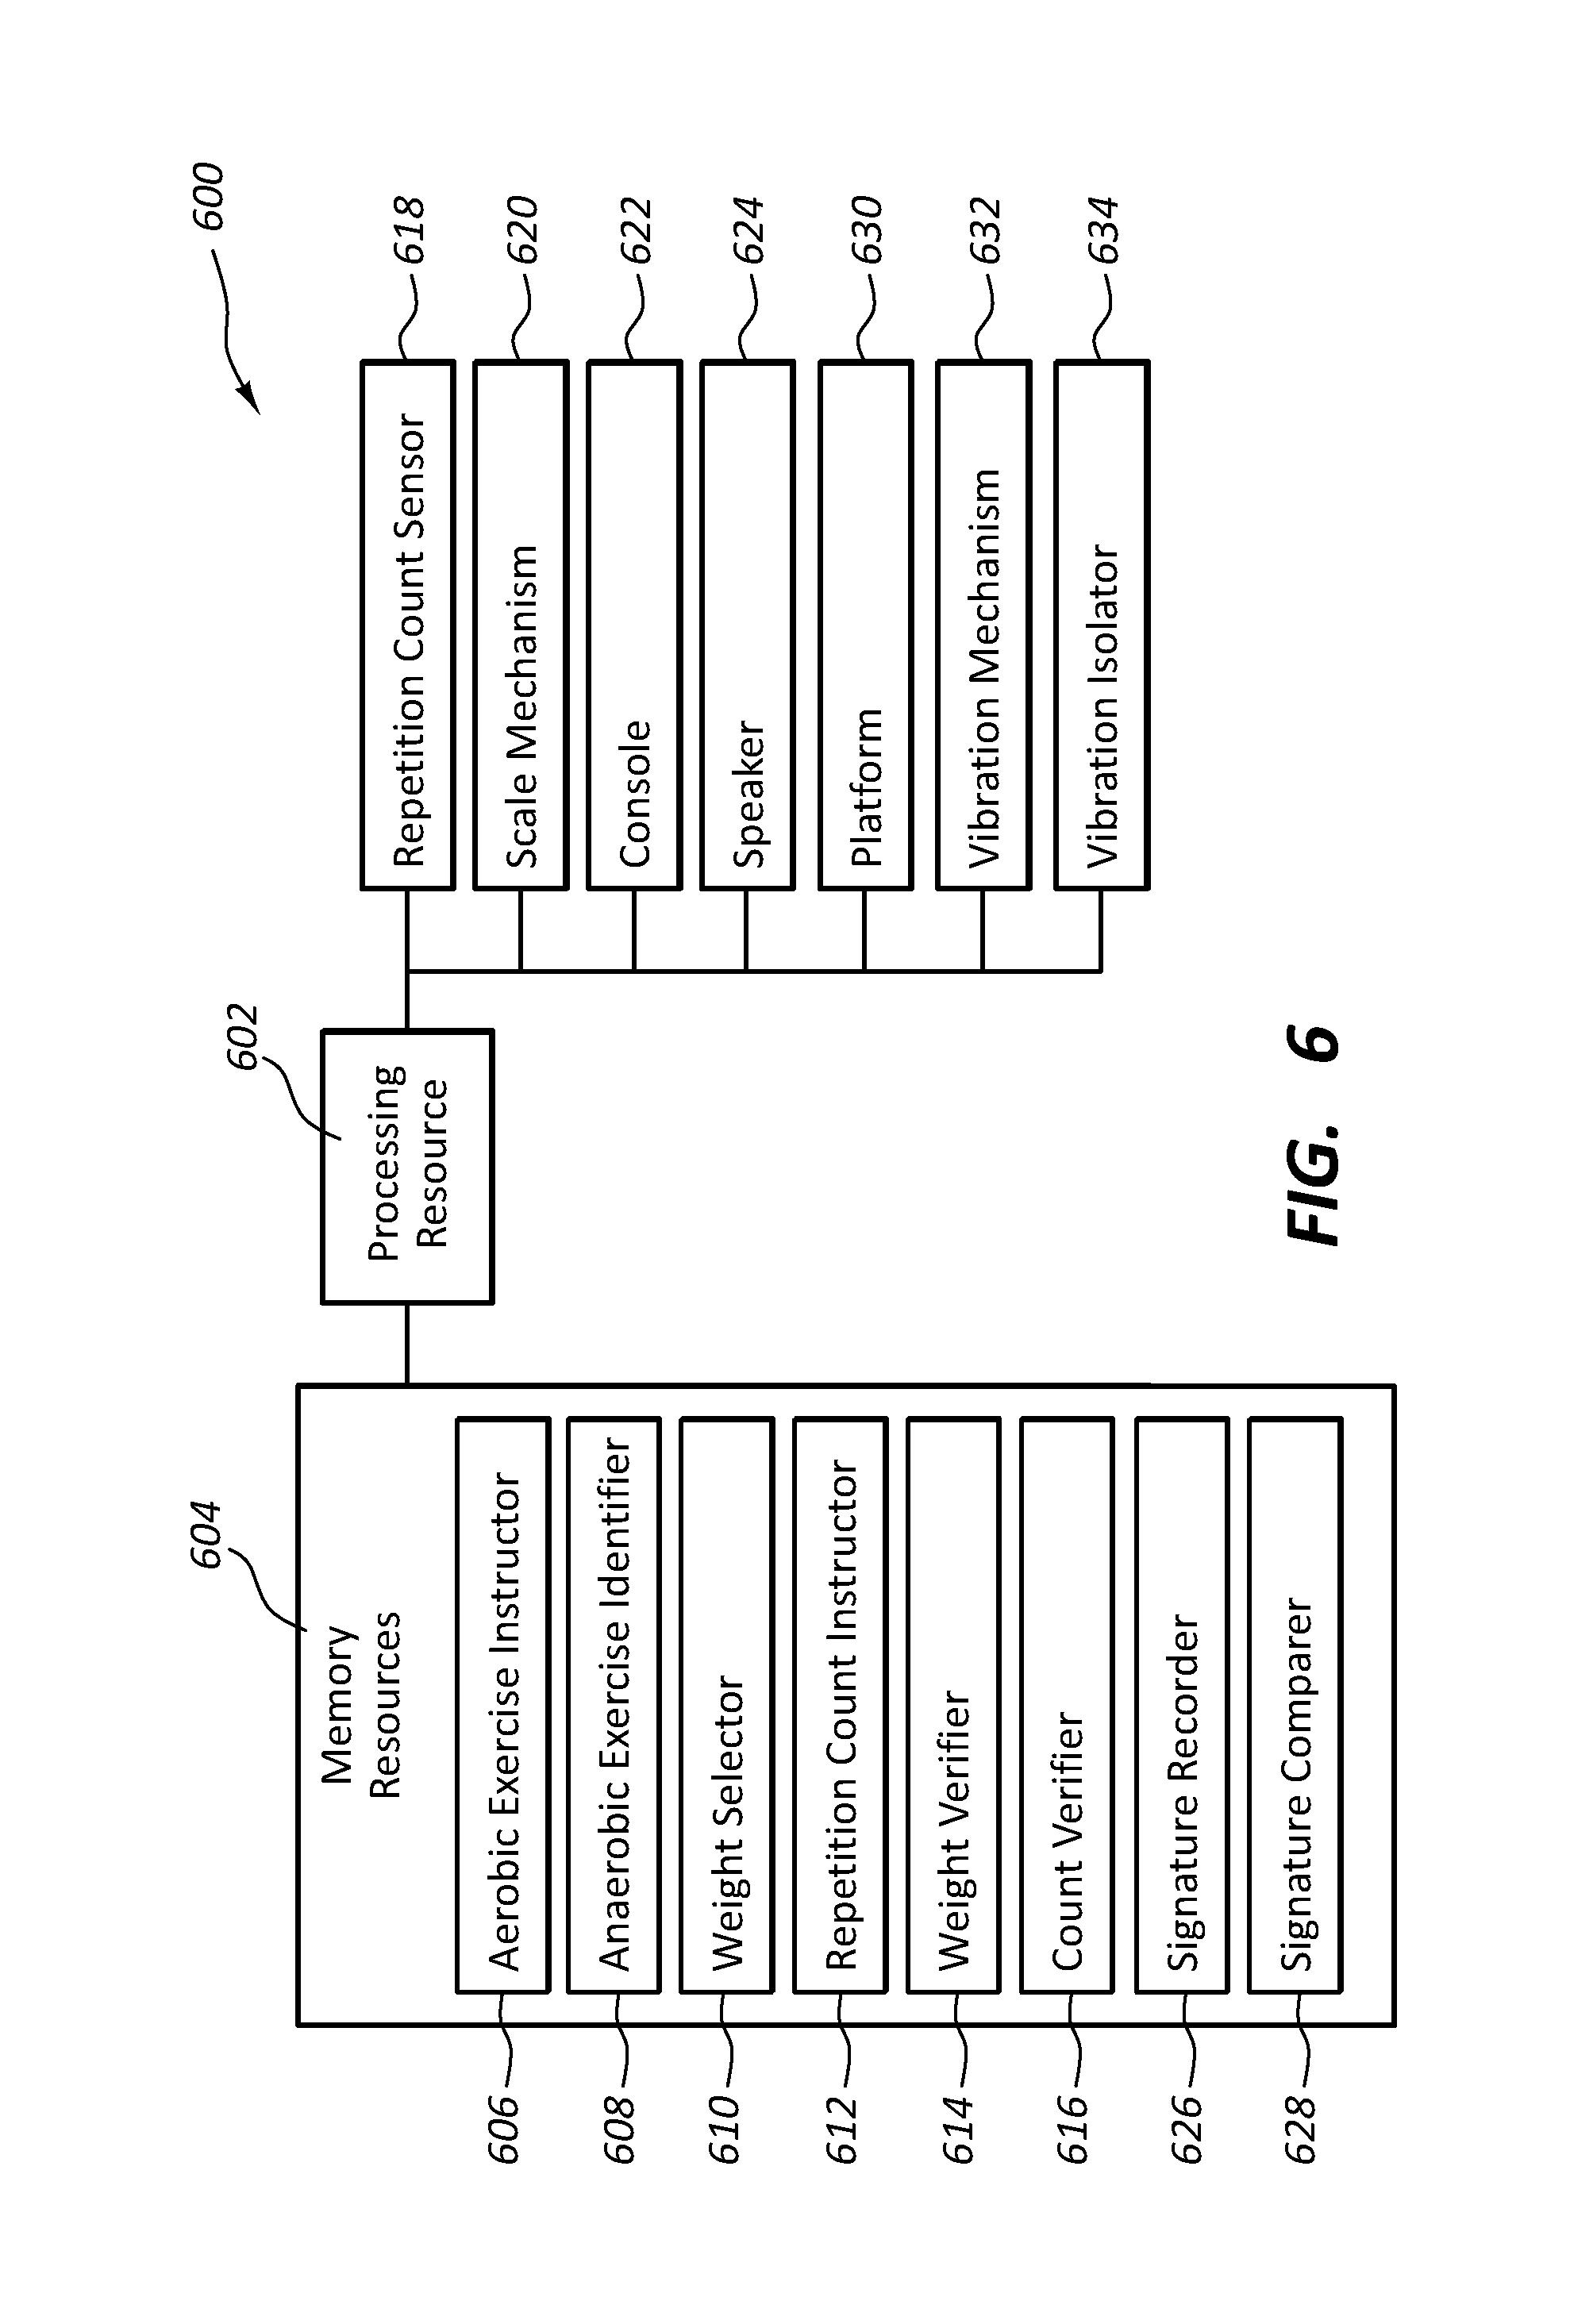 US10252109B2 - Weight platform treadmill - Google Patents